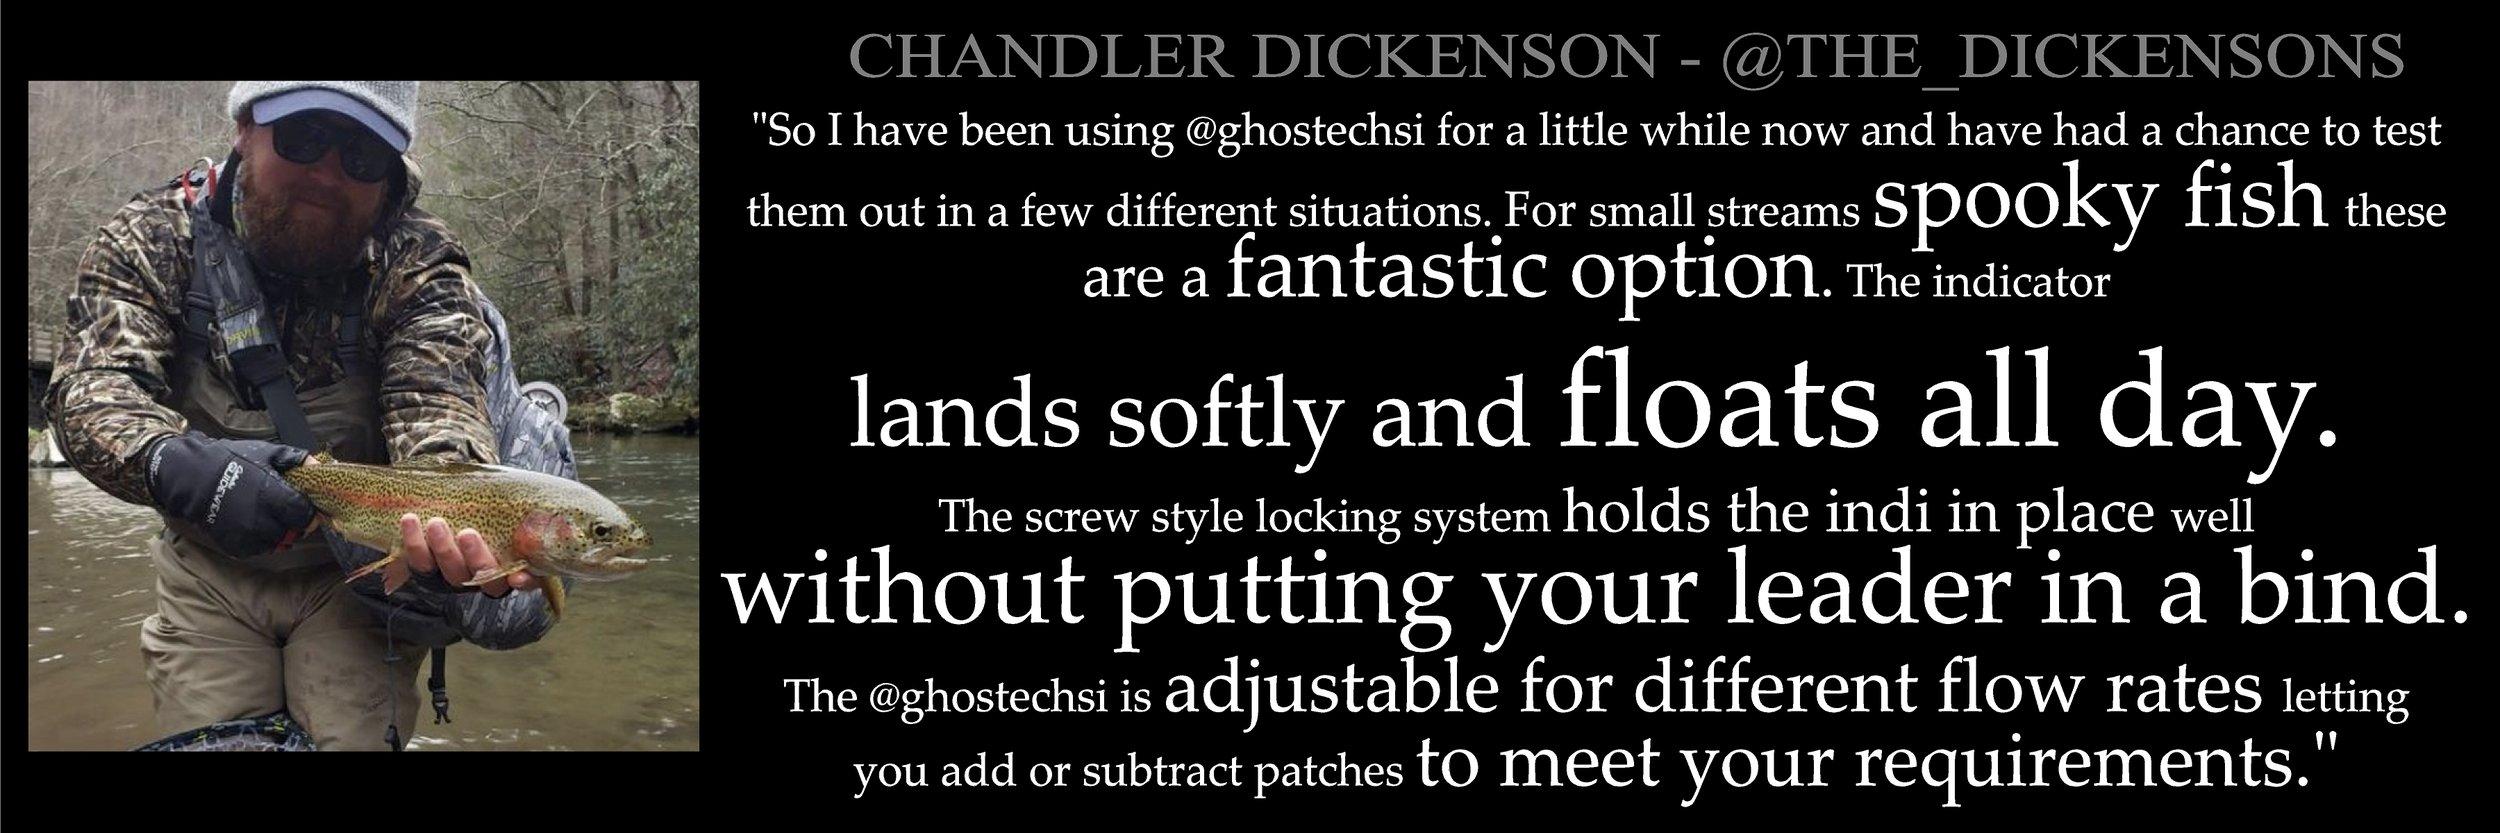 Ghostech testimonial rotator_06242019_Chandler Dickenson.jpg